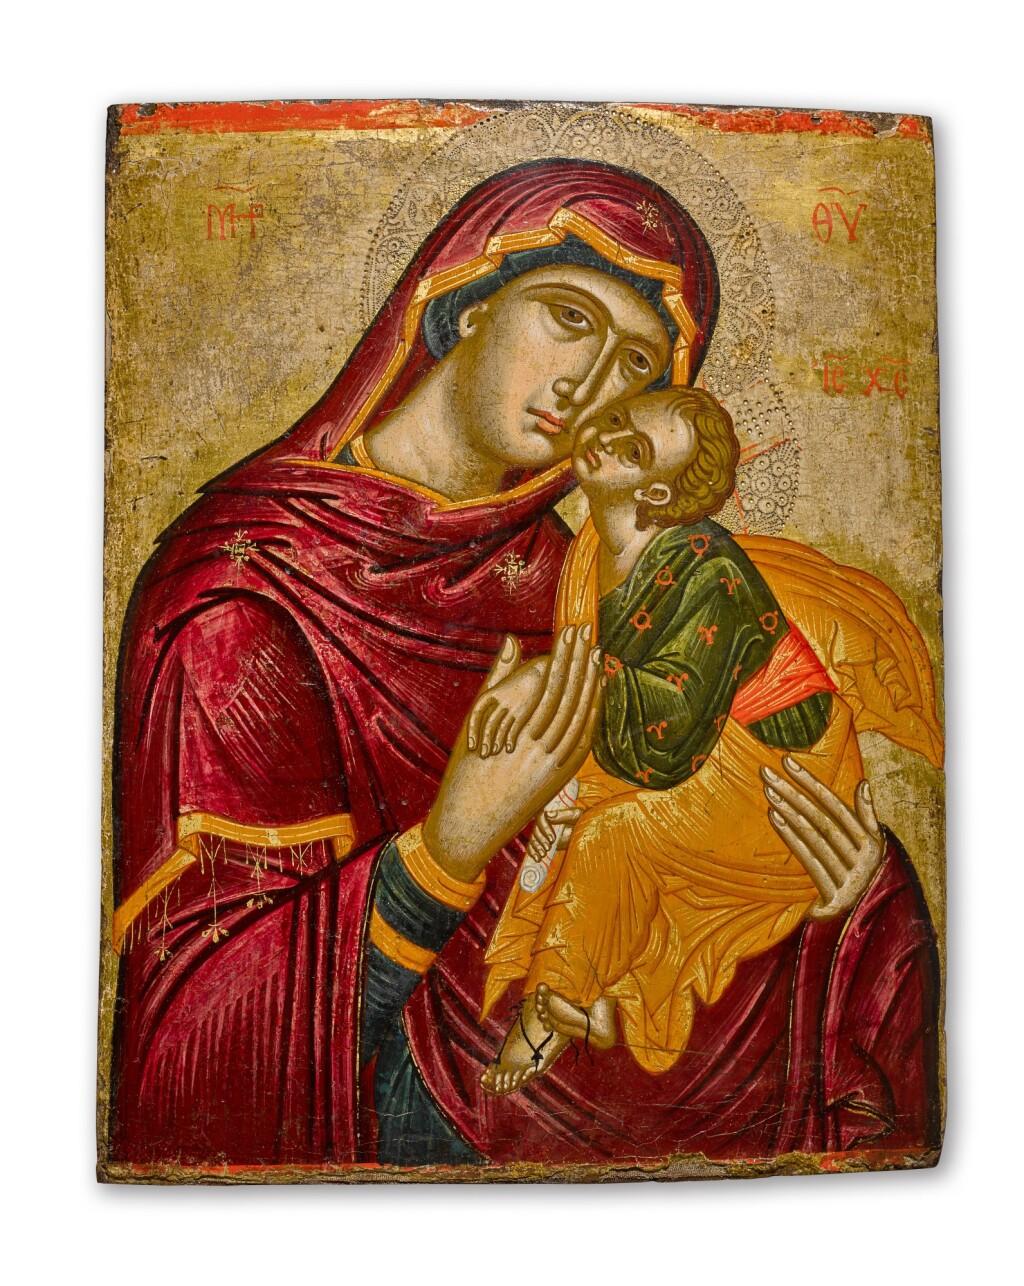 AN ICON OF THE MOTHER OF GOD GLYKOPHILOUSA, VENETO-CRETAN, 16TH CENTURY